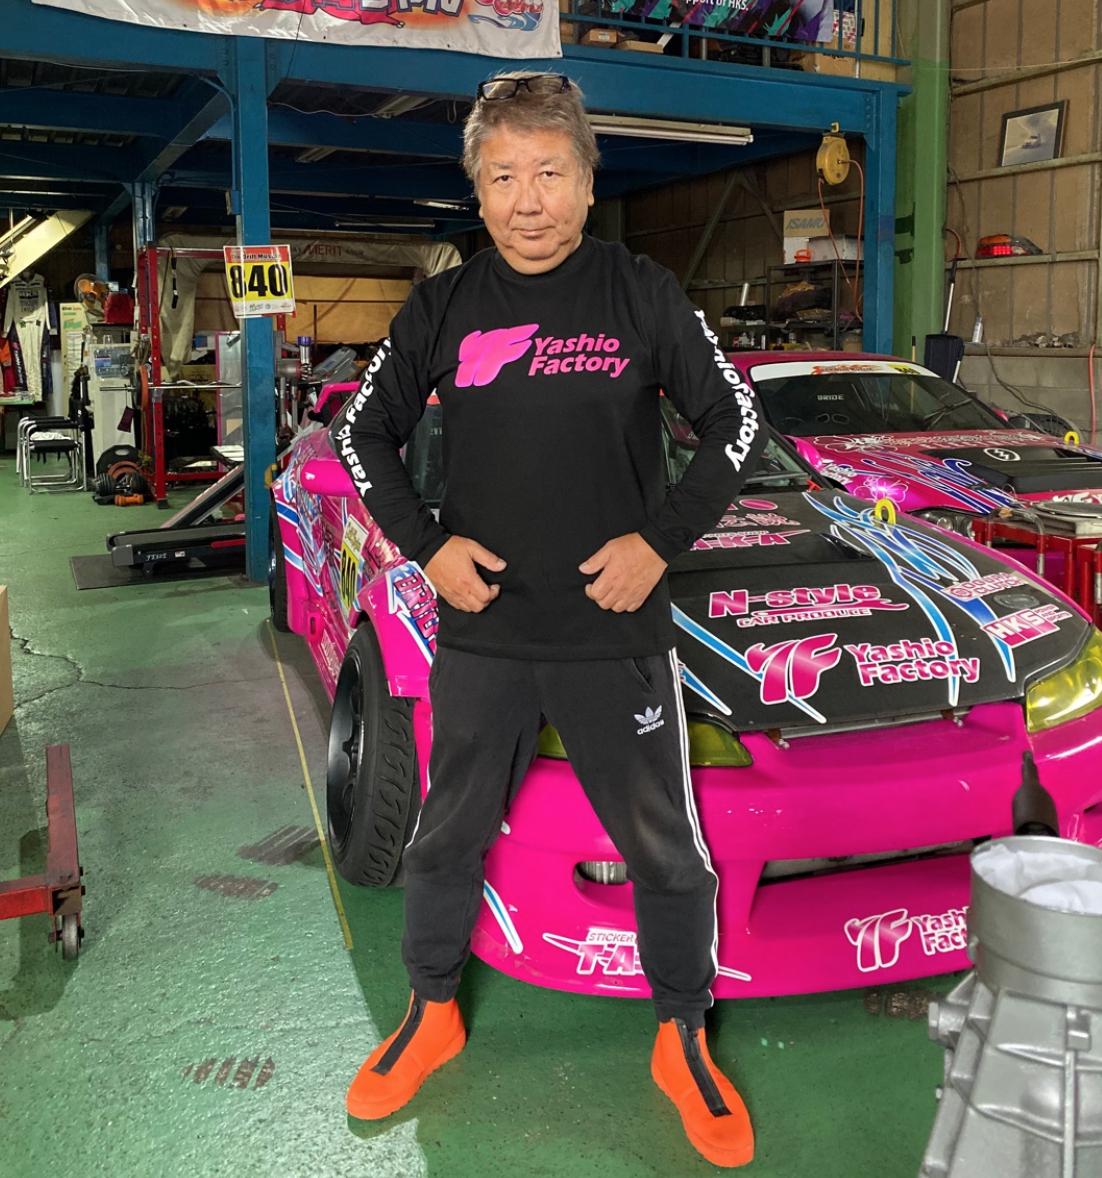 Yashio Factory New 2019 Sweatshirt